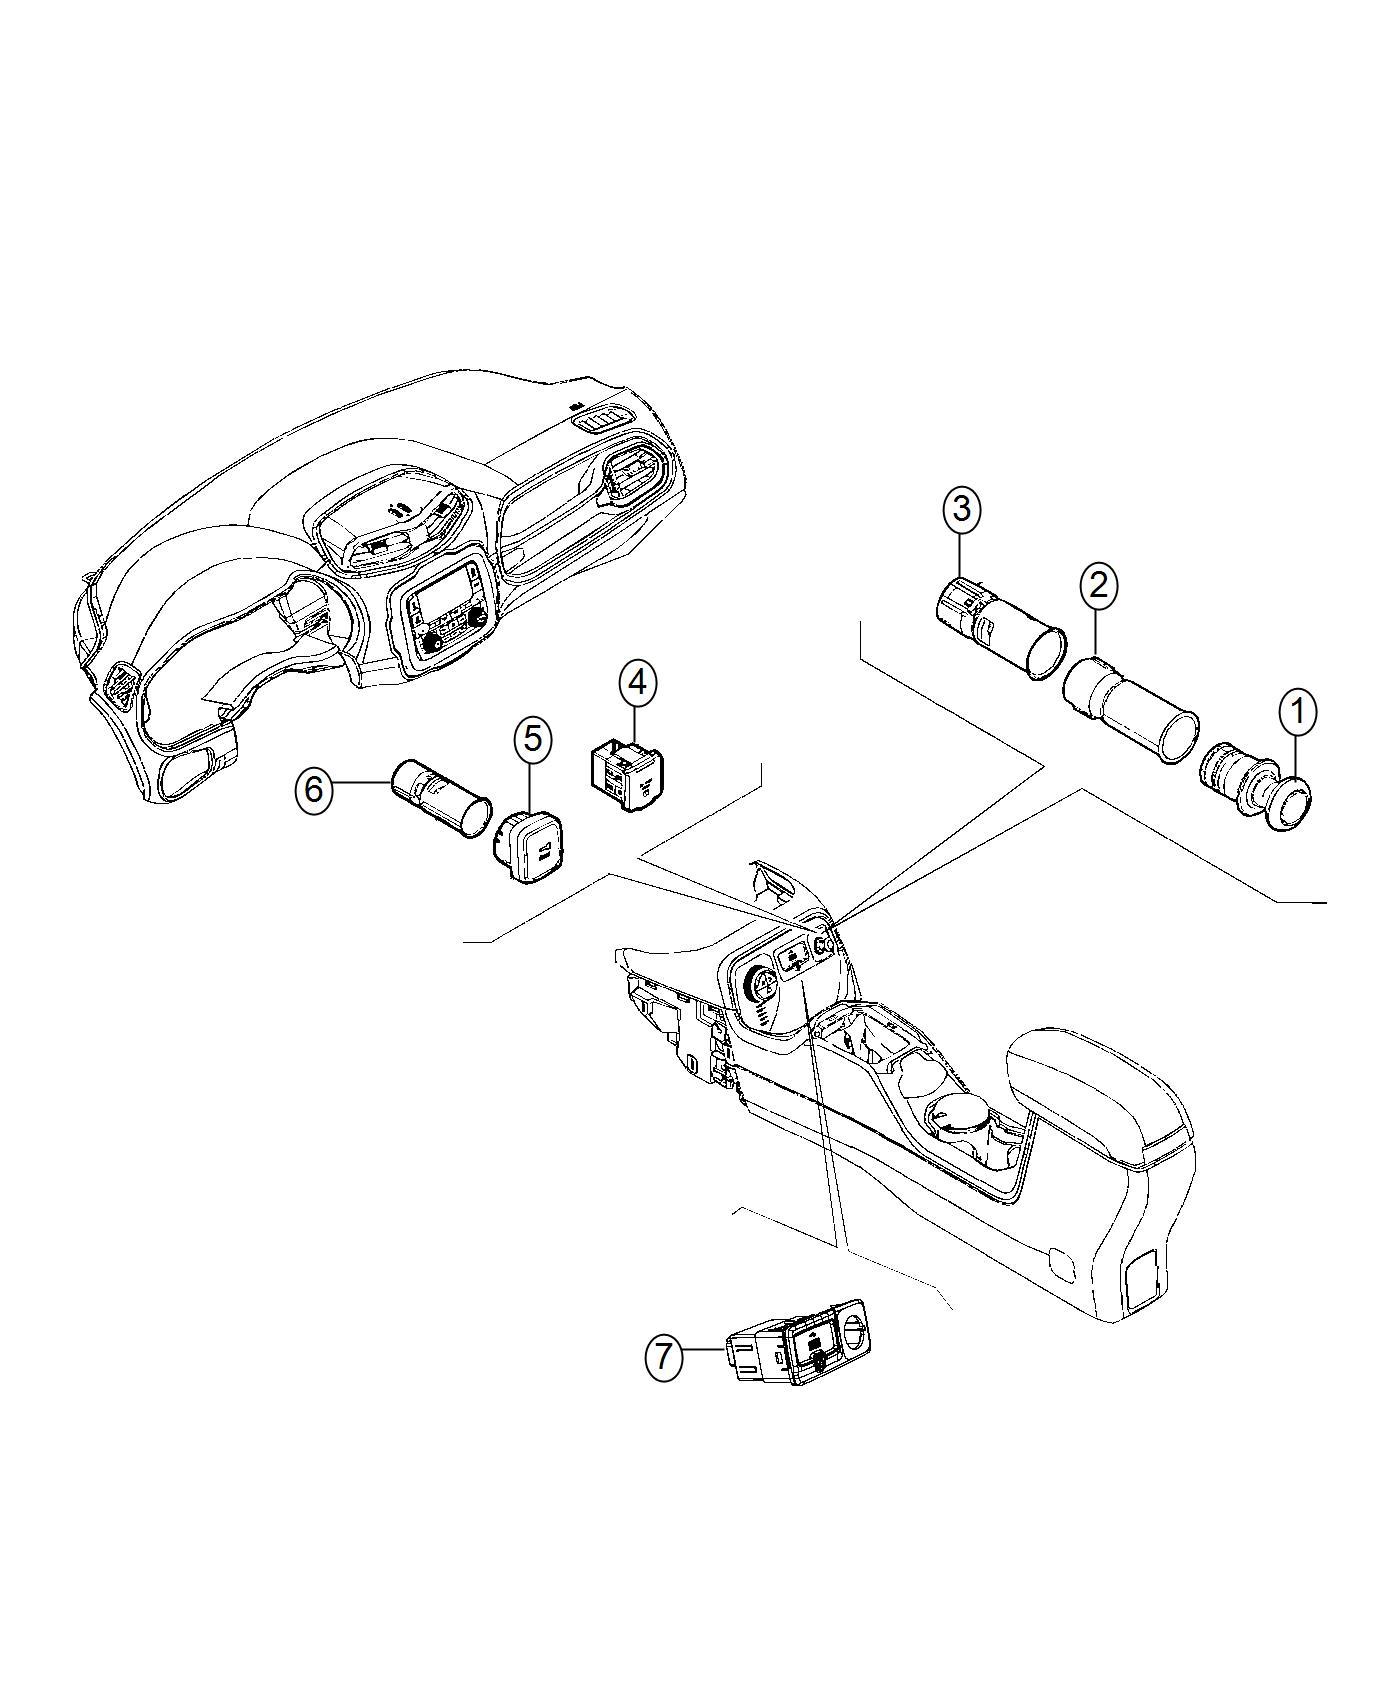 Jeep RENEGADE Power outlet. Inverter. Trim: [no